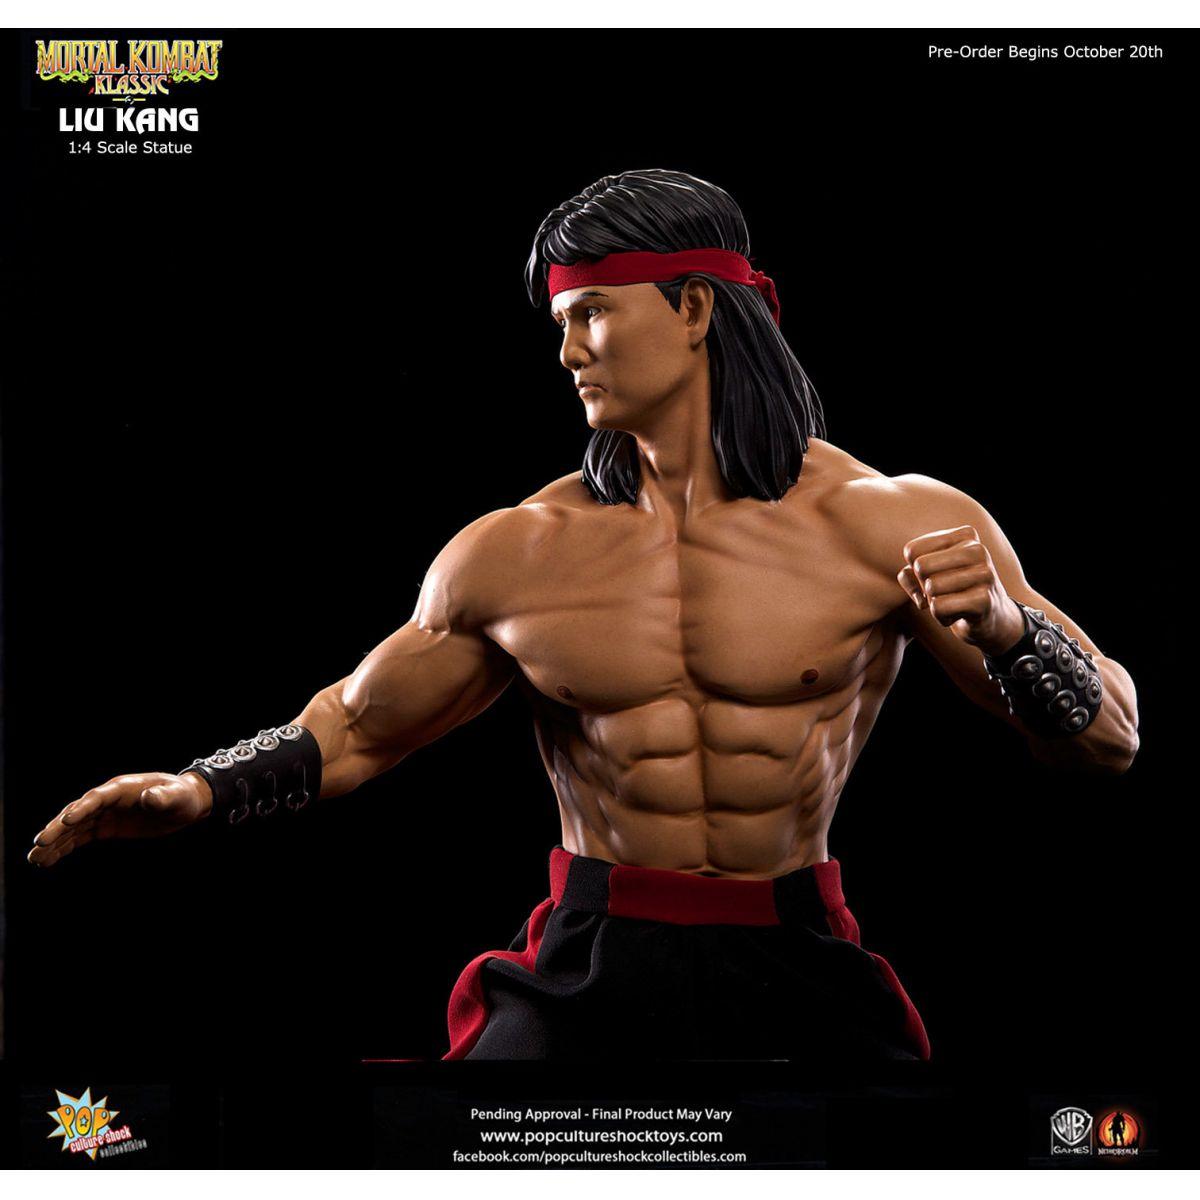 Estátua Liu Kang: Mortal Kombat (Escala 1/4) - Pop Culture Shock - Black Friday (Apenas Venda Online)